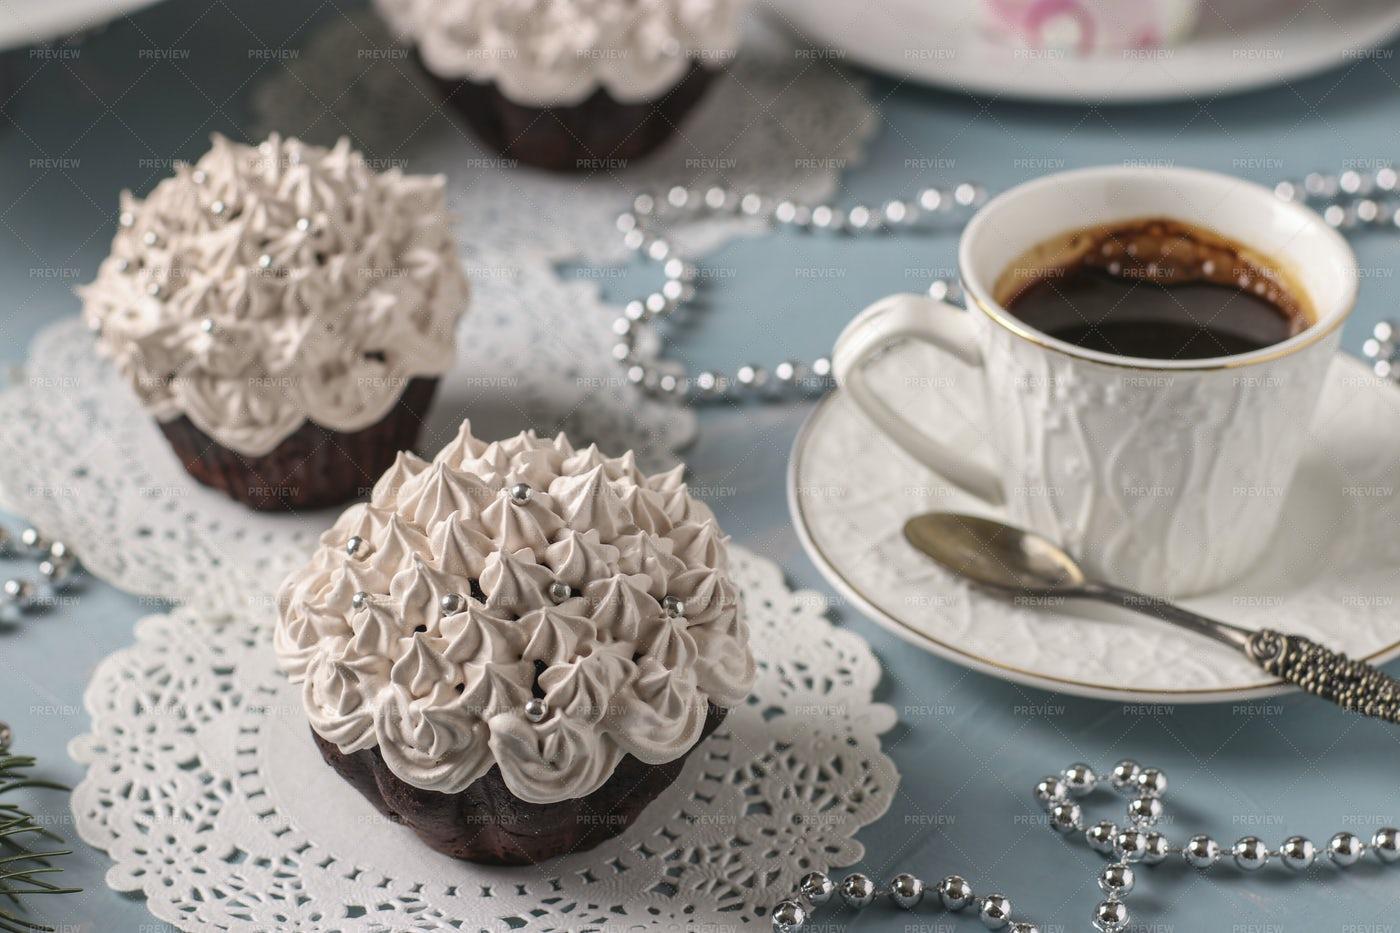 Chocolate Cupcakes With Cream: Stock Photos